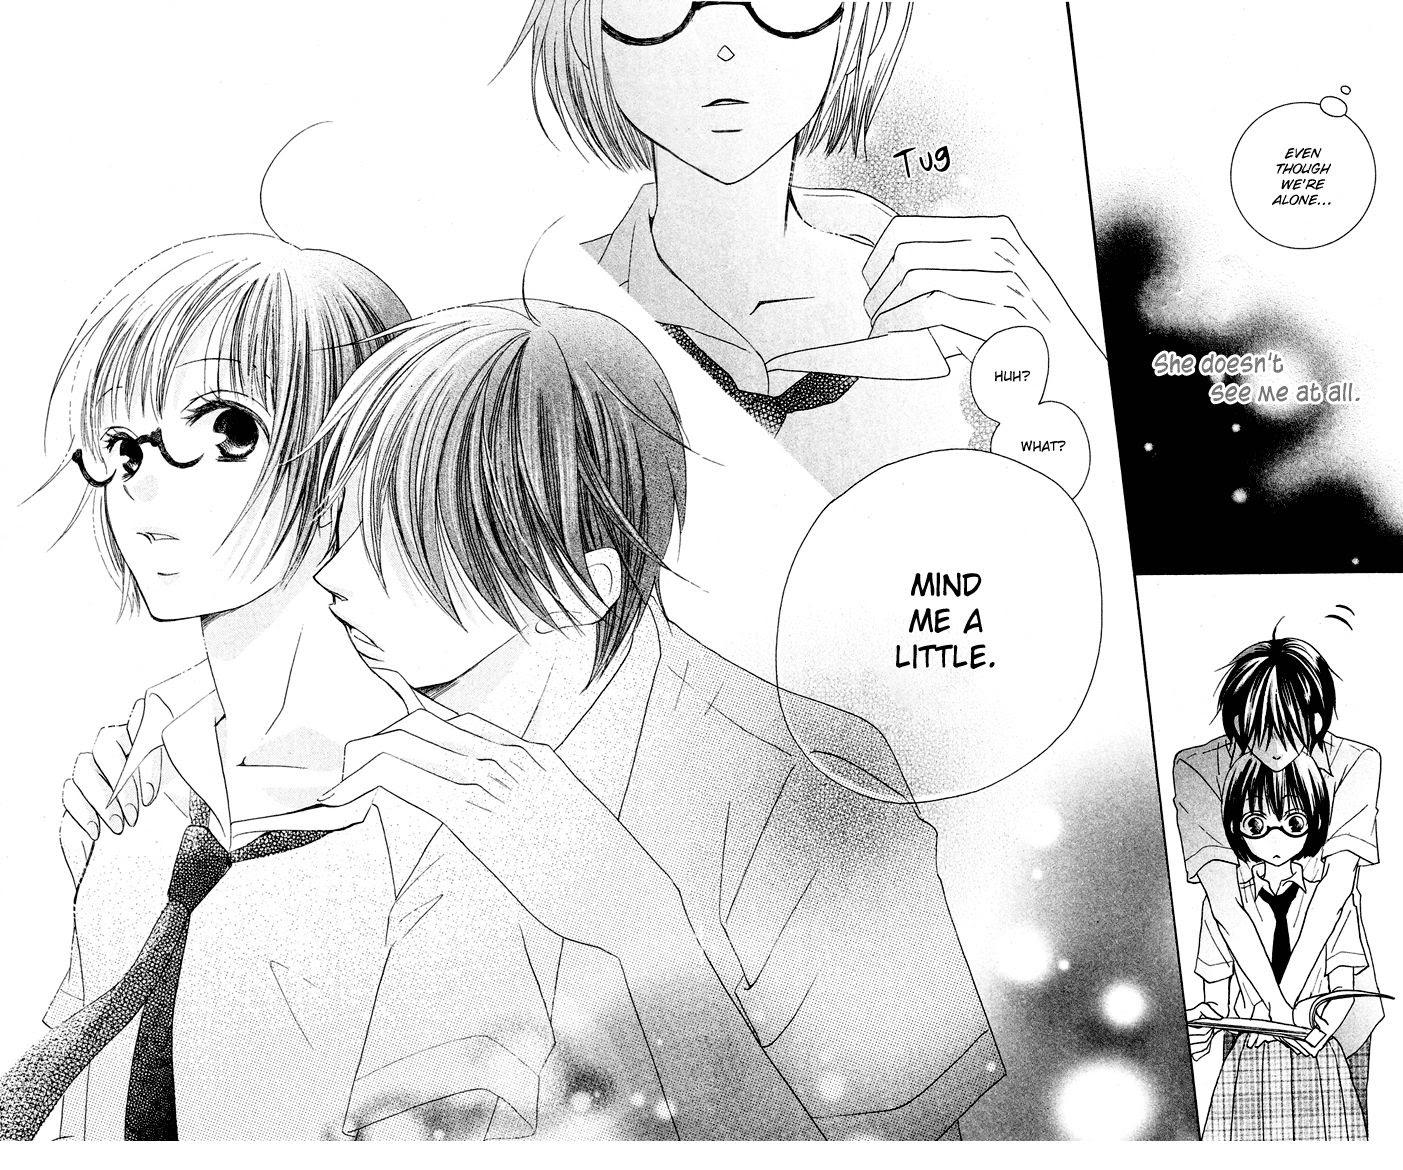 Komik Anime Manga Romance